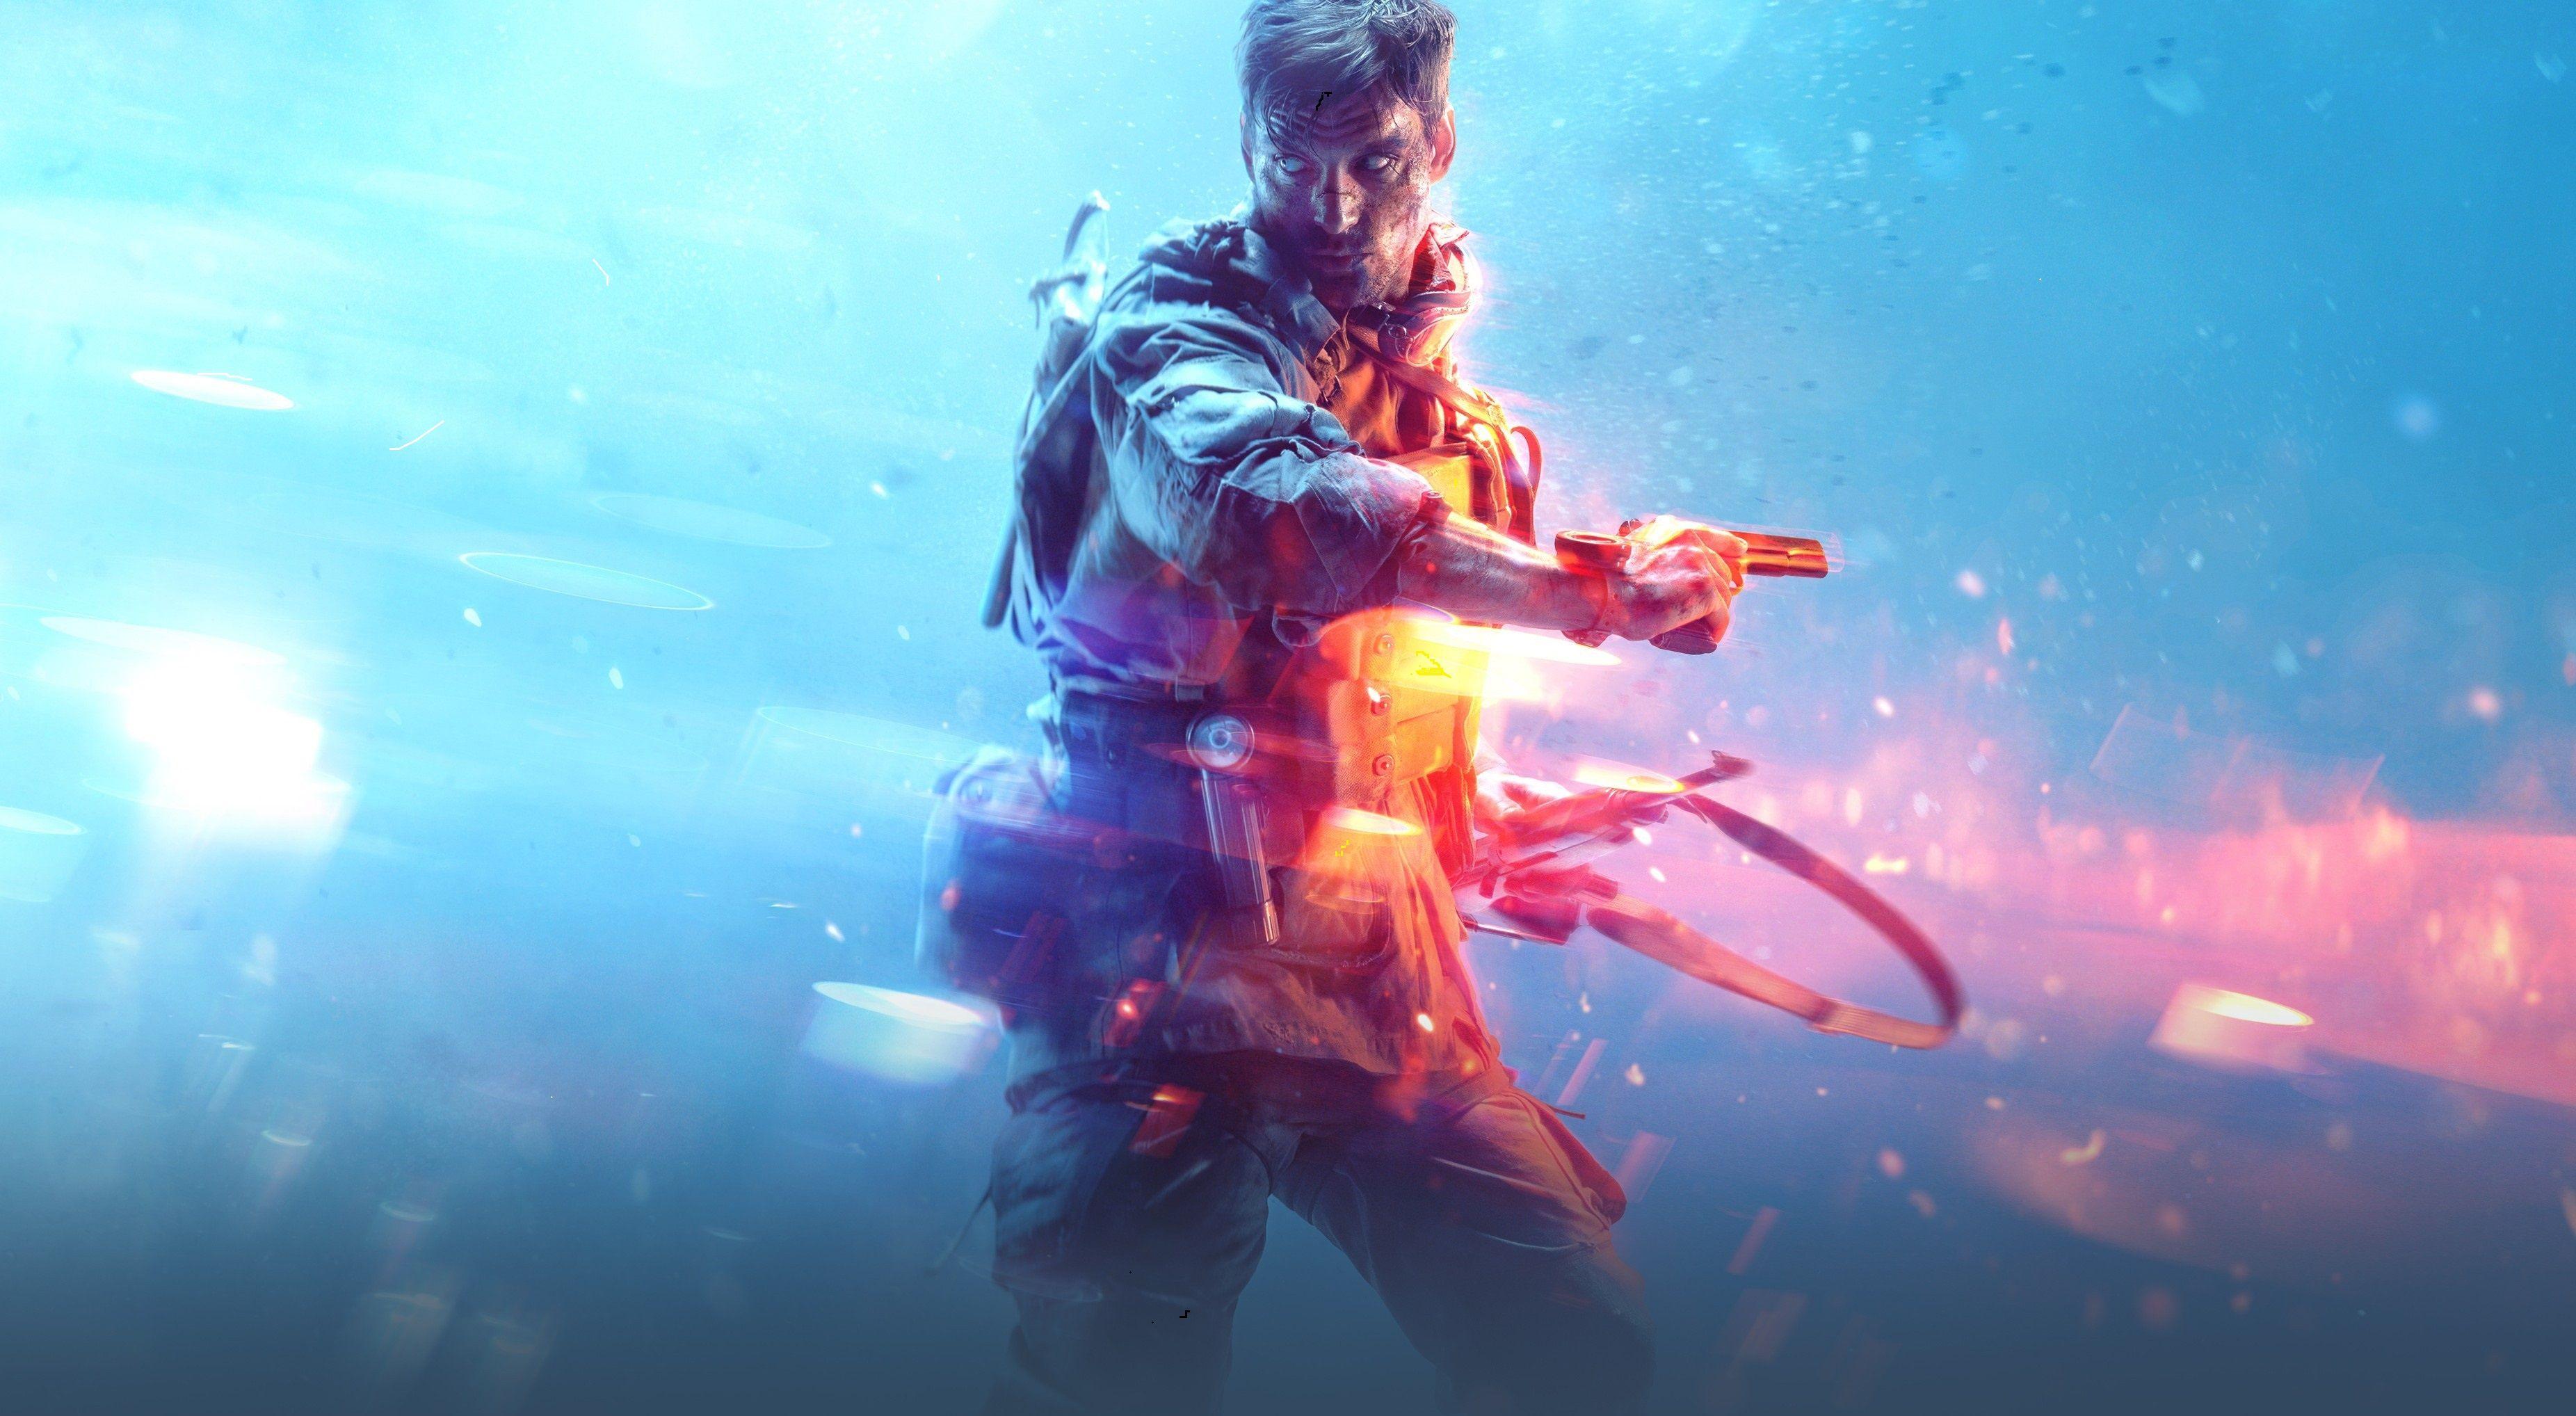 Battlefield 5 Game Wallpaper 4k Download Full HD Wallpapers 3704x2036